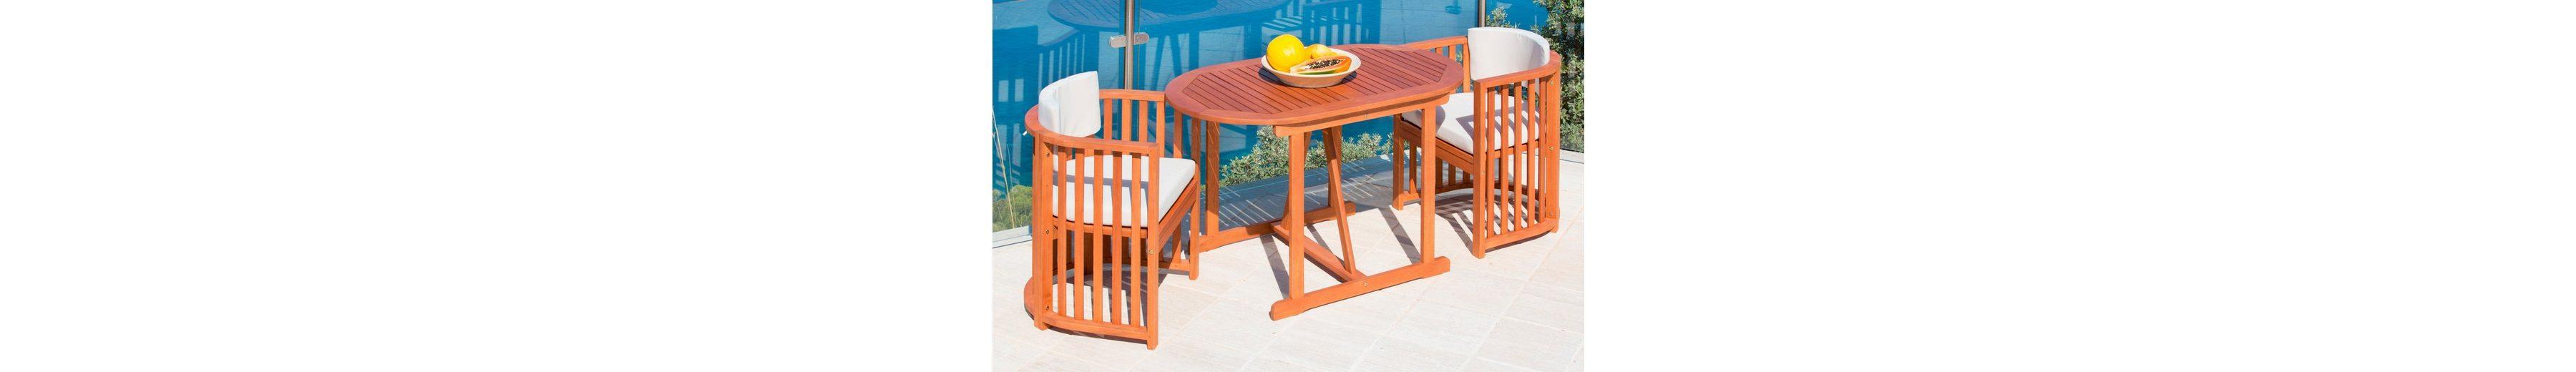 7-tgl. Gartenmöbelset »Brasilia«, 2 Sessel, Tisch 120x70 cm, Eukalyptusholz